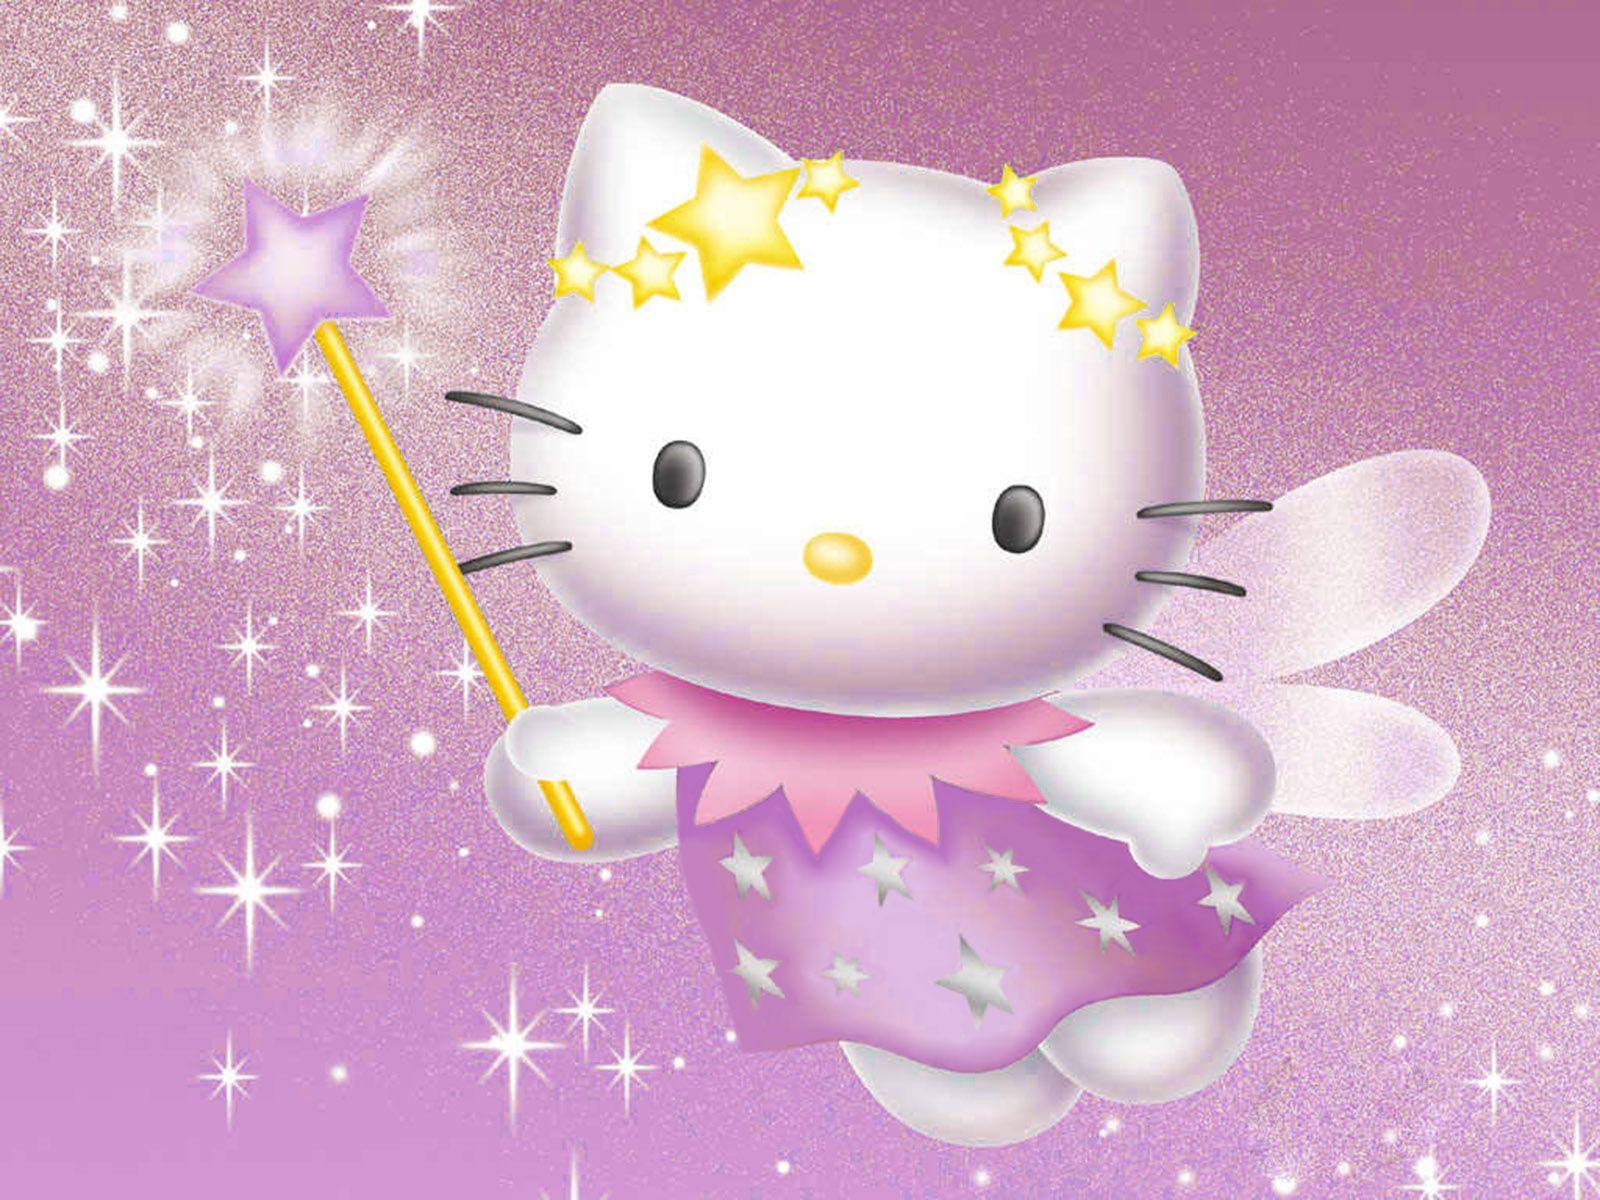 Cartoons Hello Kitty Free High Quality Pictures Wallpaper Hello Kitty Backgrounds Hello Kitty Wallpaper Hello Kitty Pictures